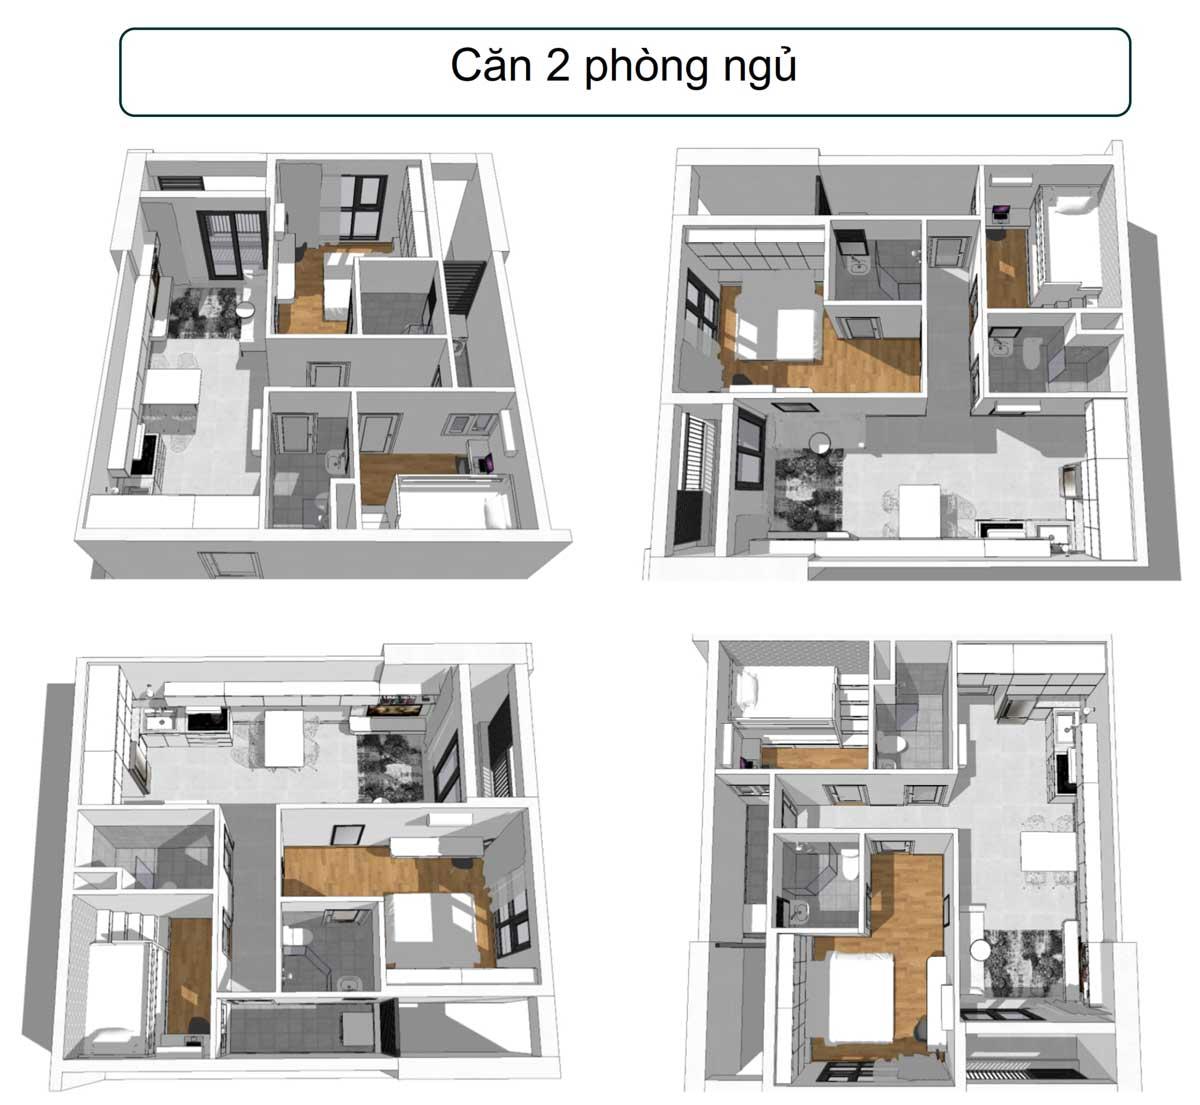 phuc-dat-tower-thiet-ke-can-ho